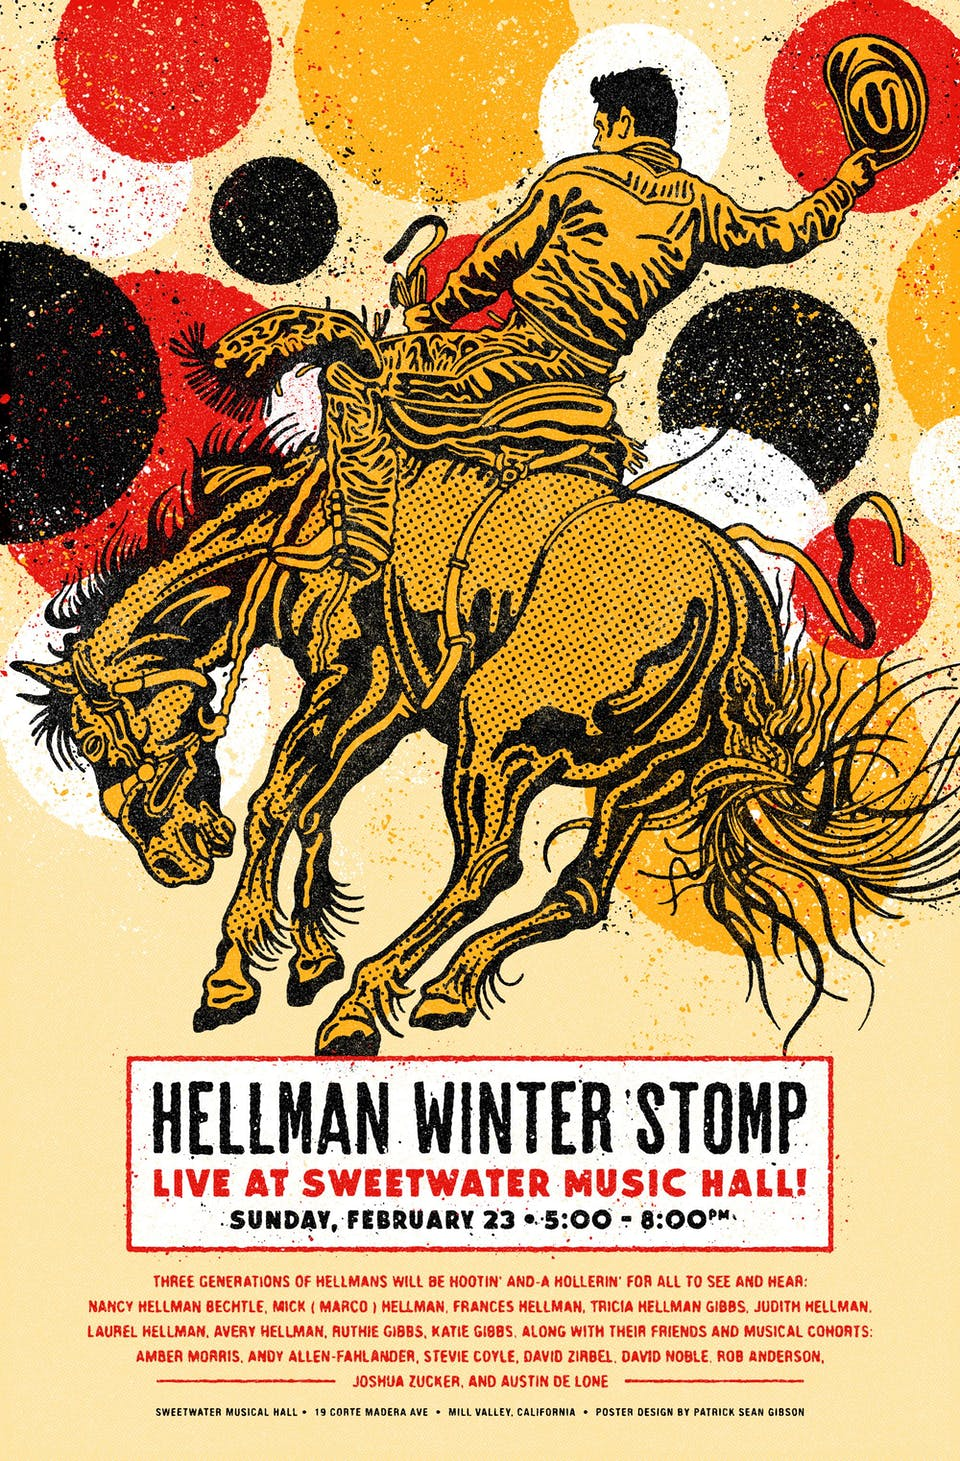 Hellman Winter Stomp